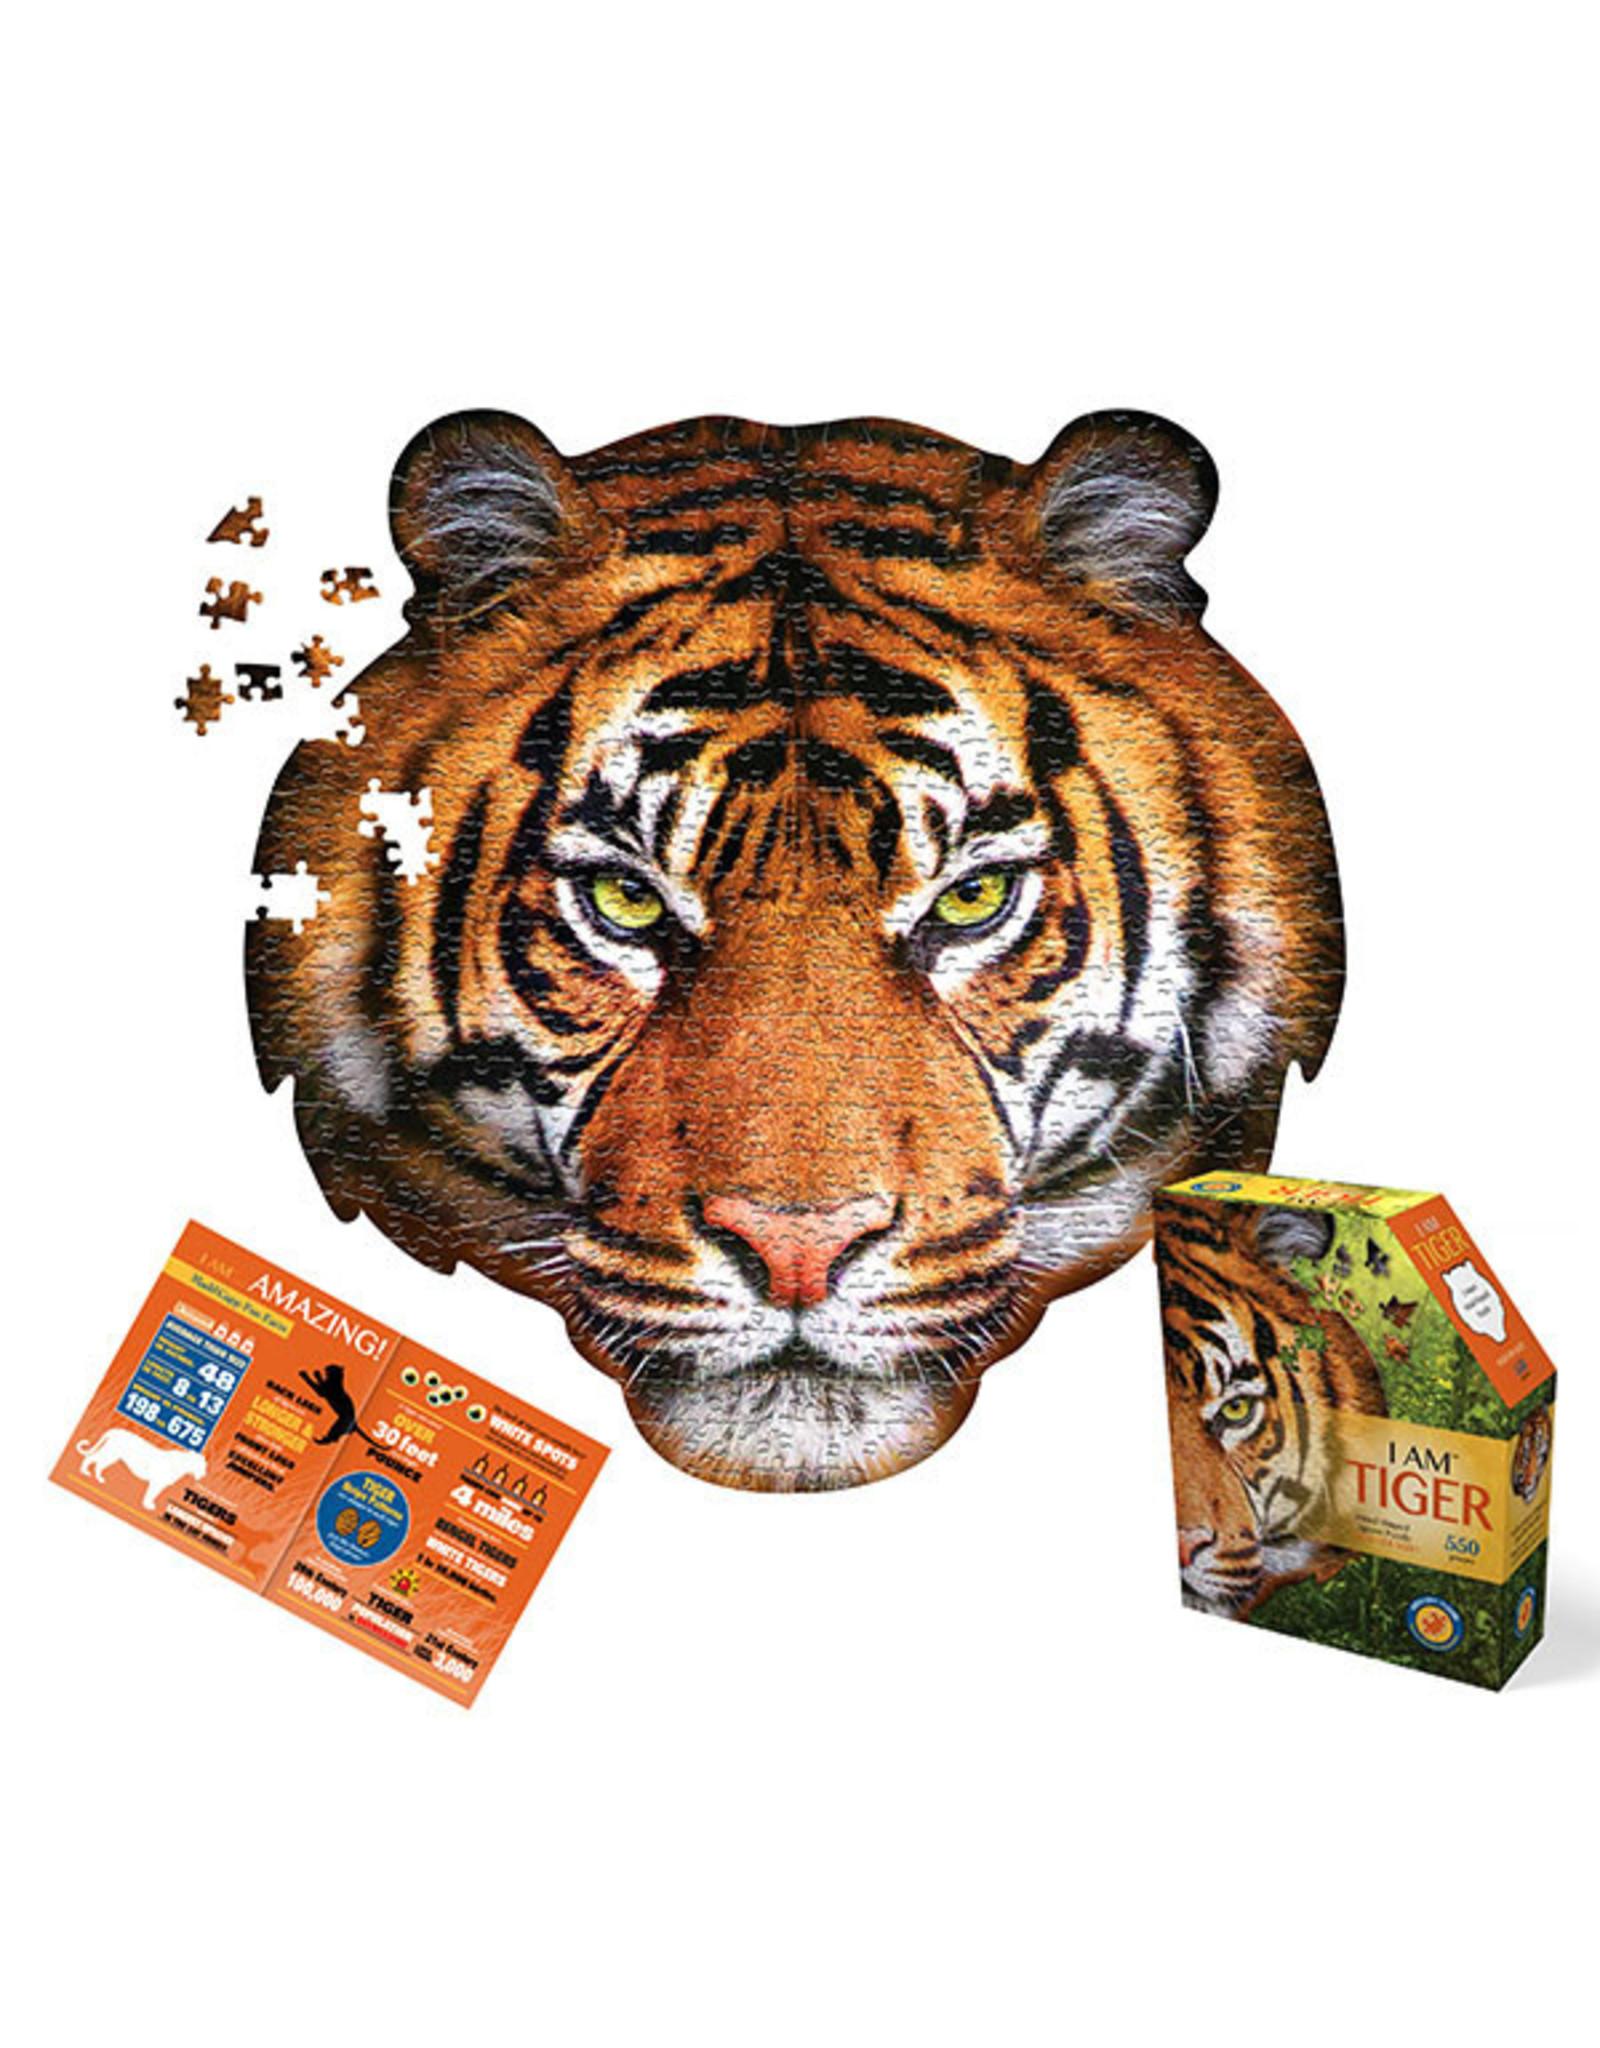 Madd Capp I am Tiger 550pc Shaped Puzzle